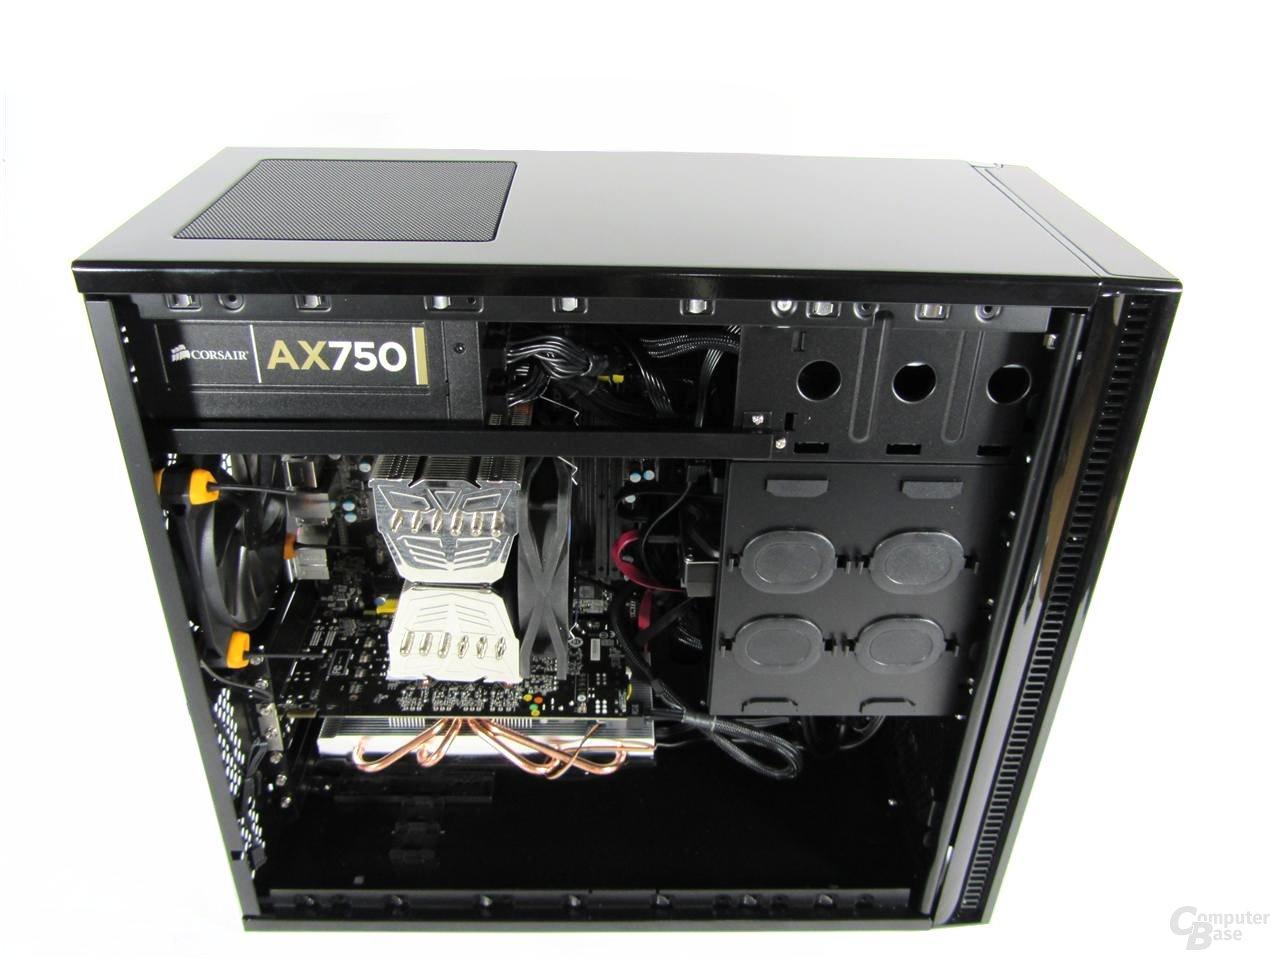 Antec Solo II – Innenraum mit eingebauter Hardware